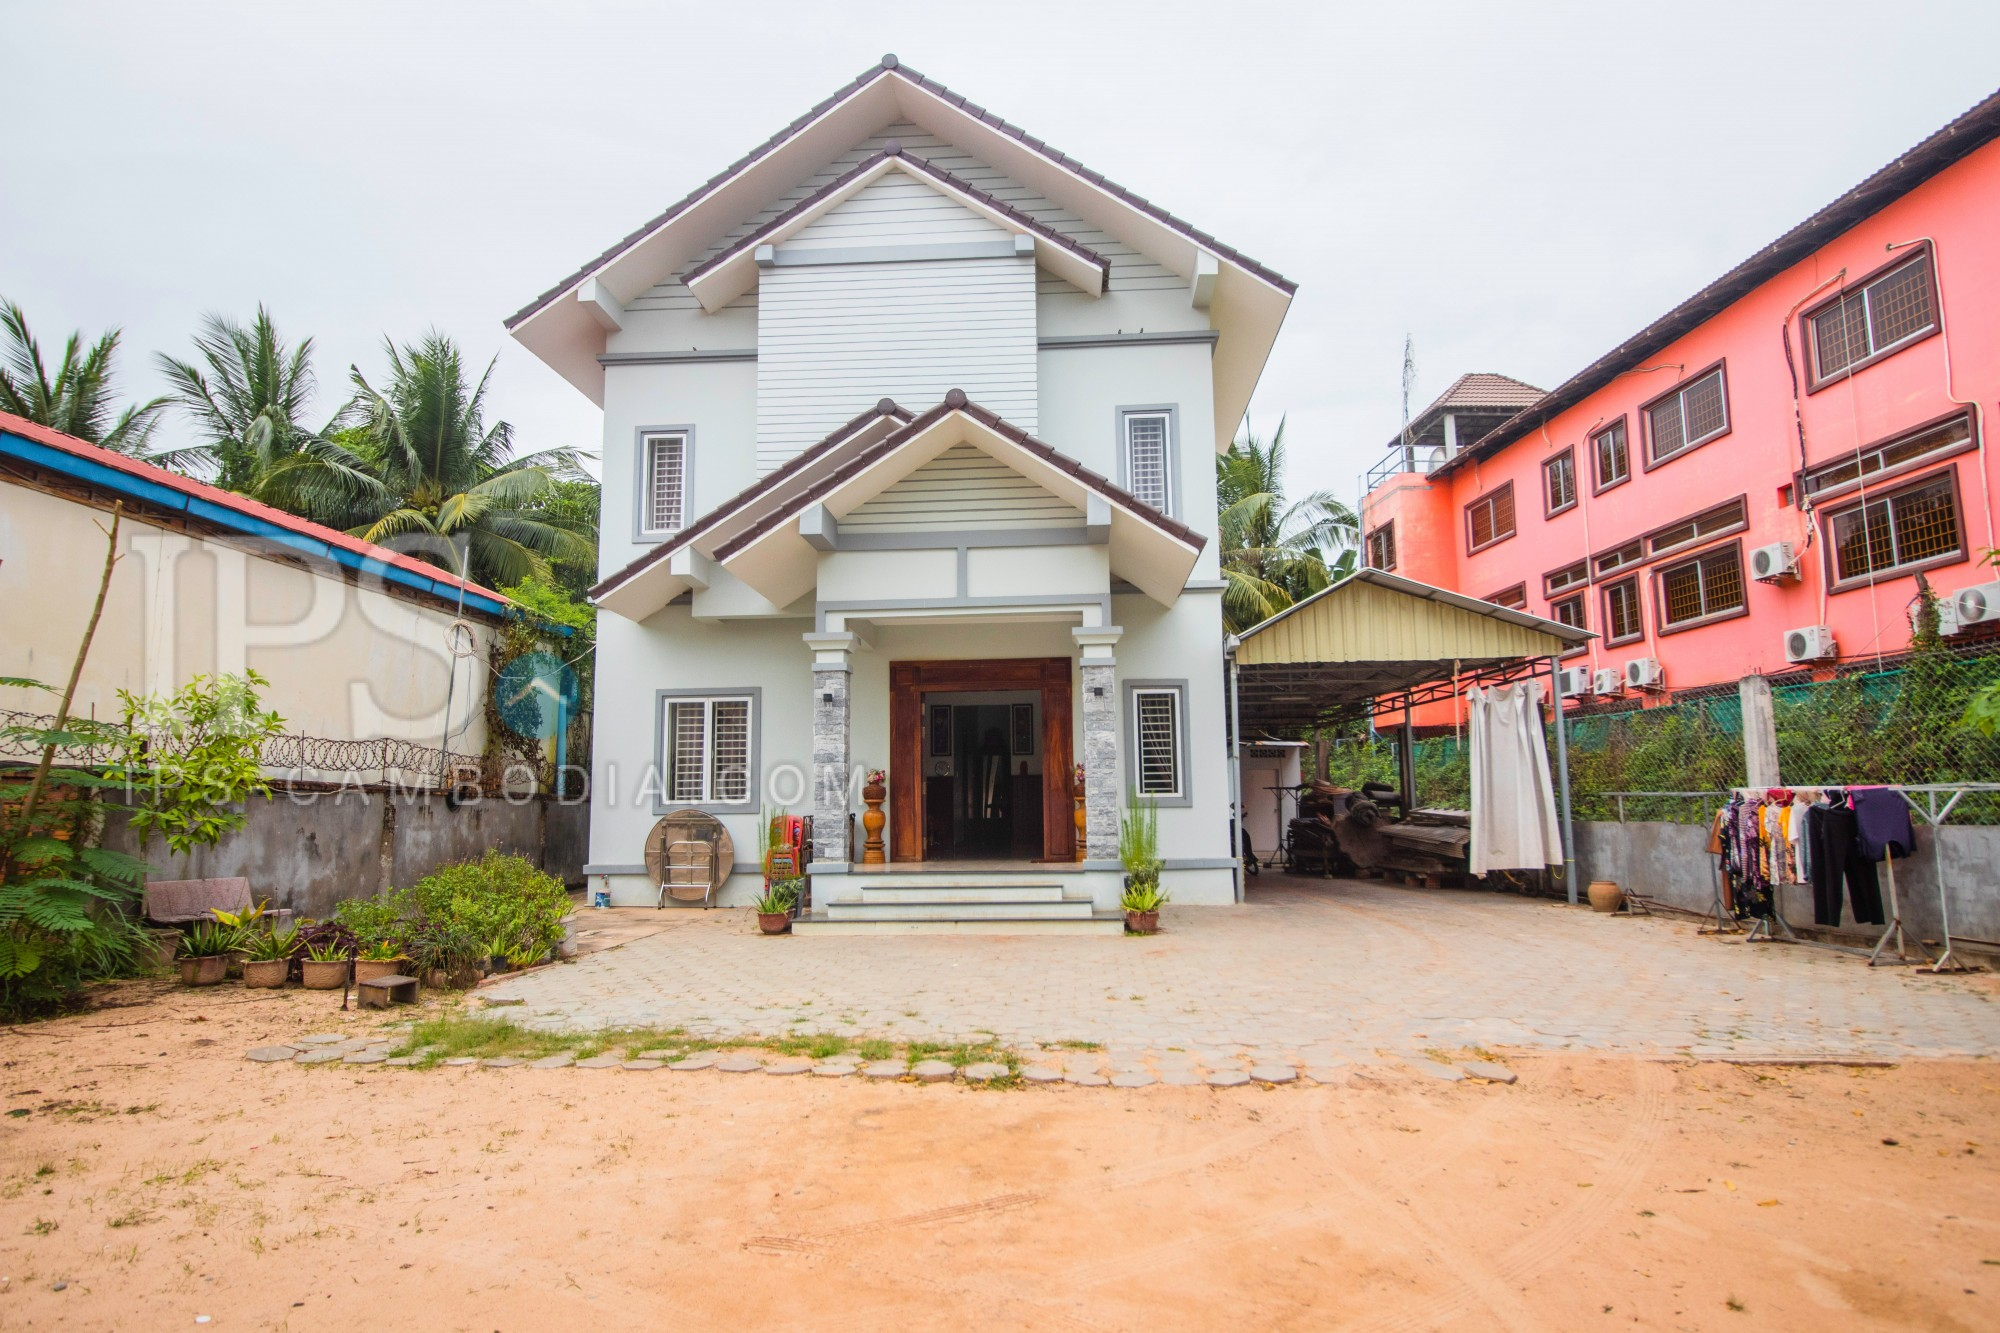 650 Sqm Land With House For Sale - Sala Kamreuk, Siem Reap